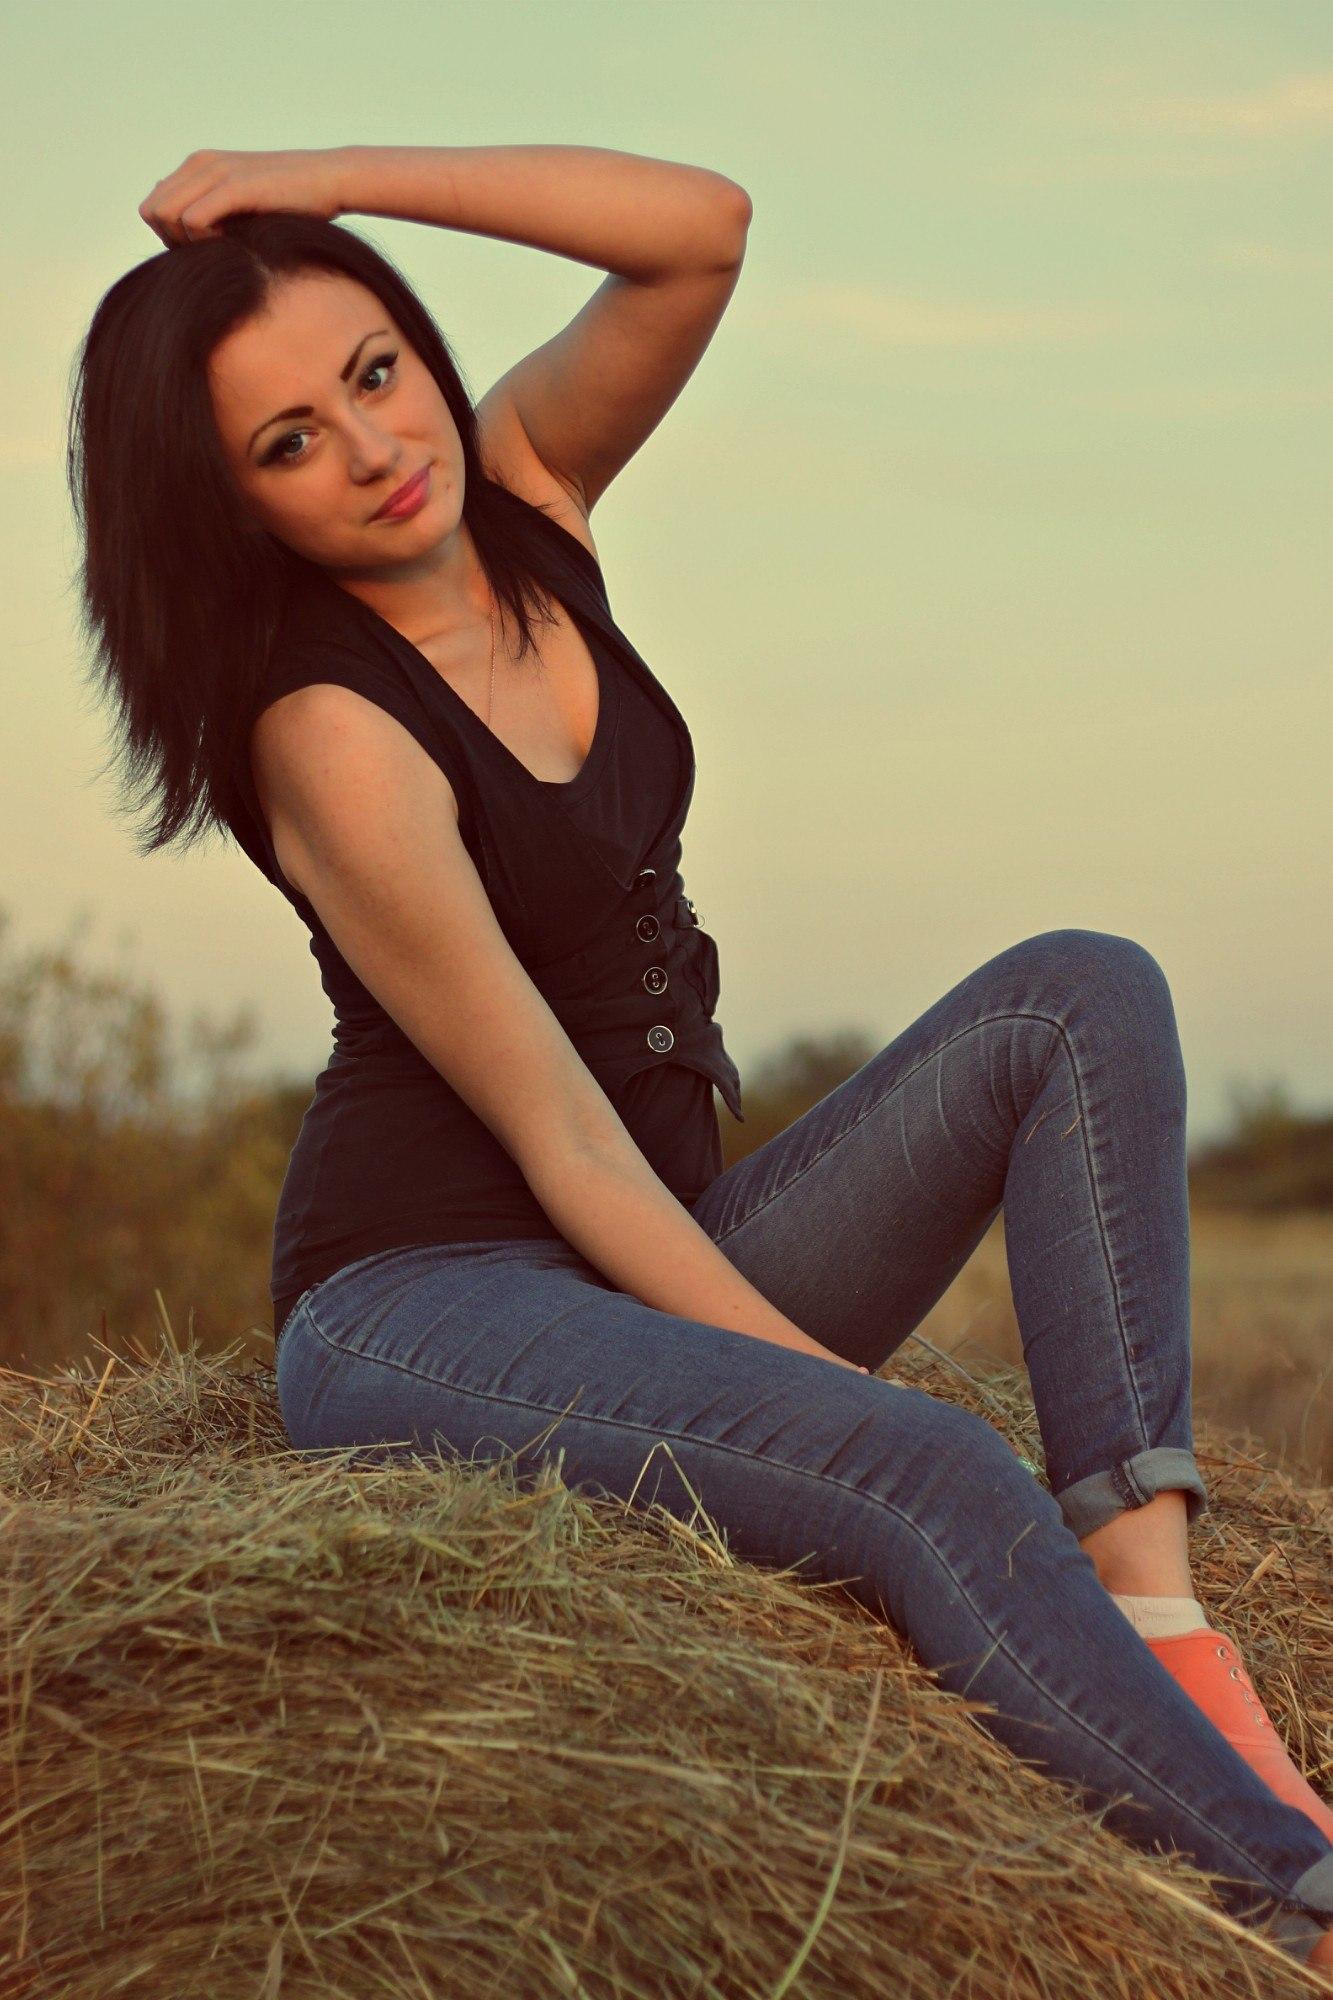 Русски голи девички 12 фотография